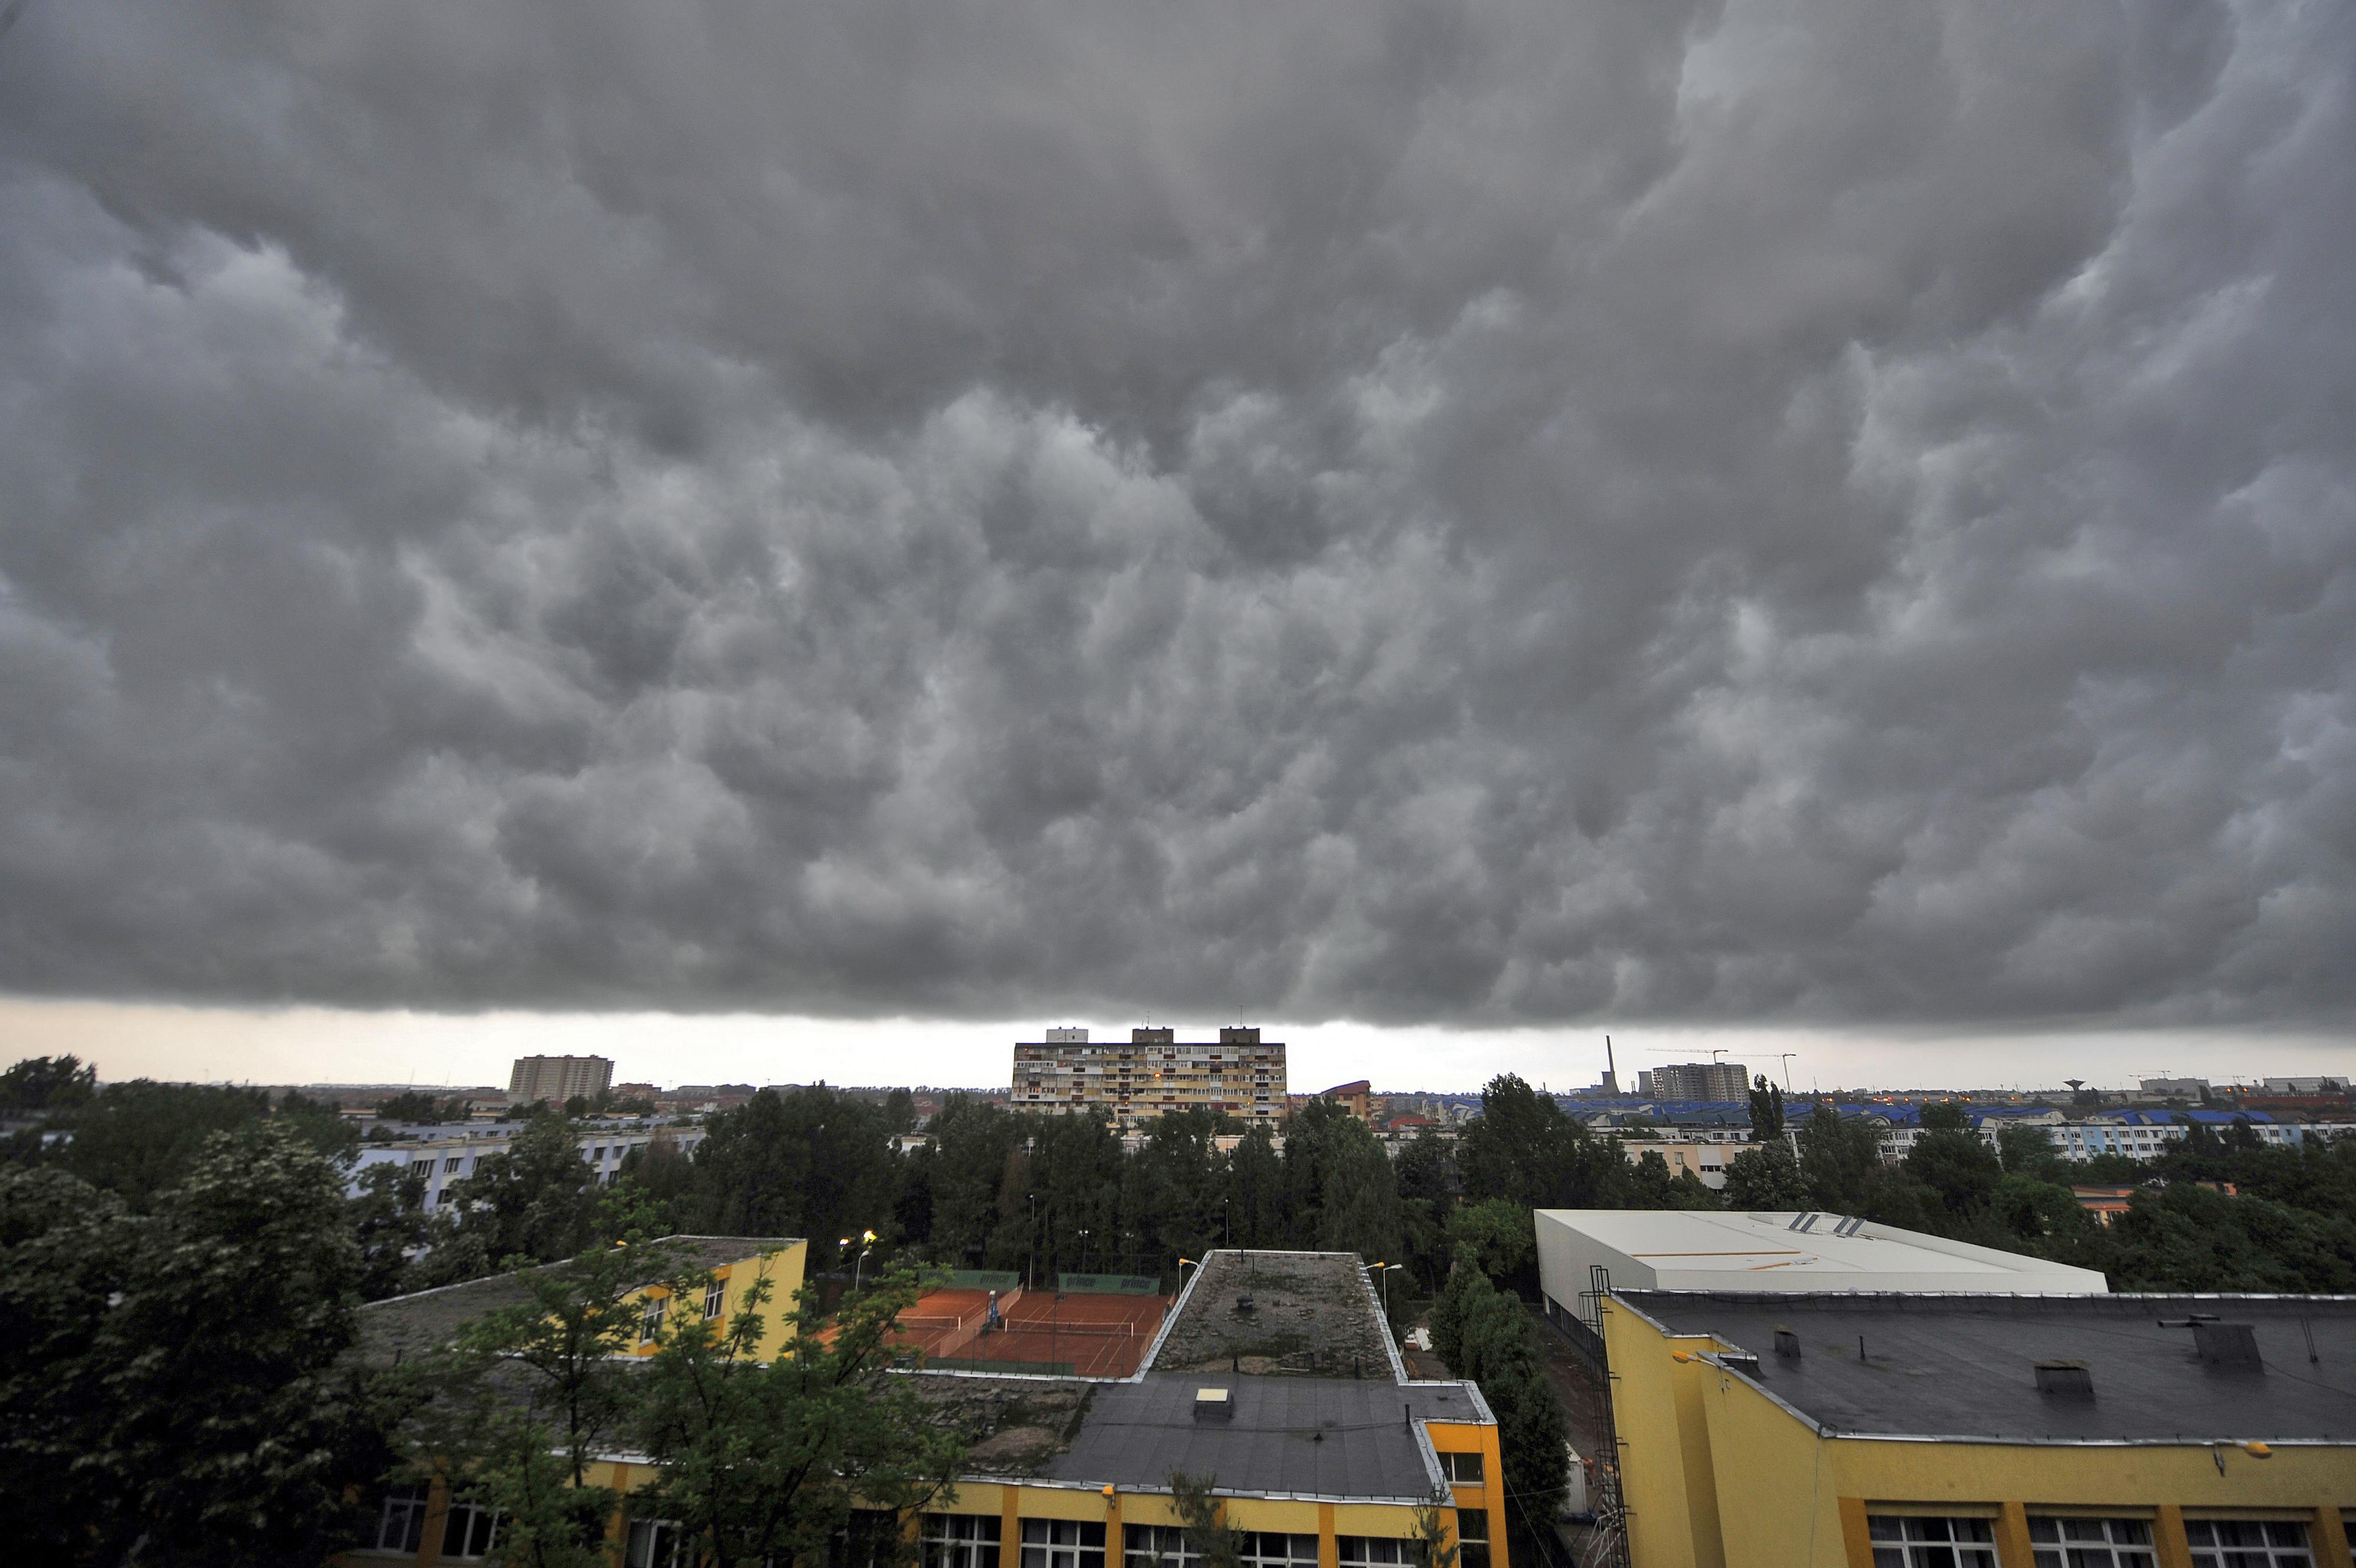 Avertizare meteo de ploi torentiale, vant si ninsori pana vineri dimineata. Zonele afectate